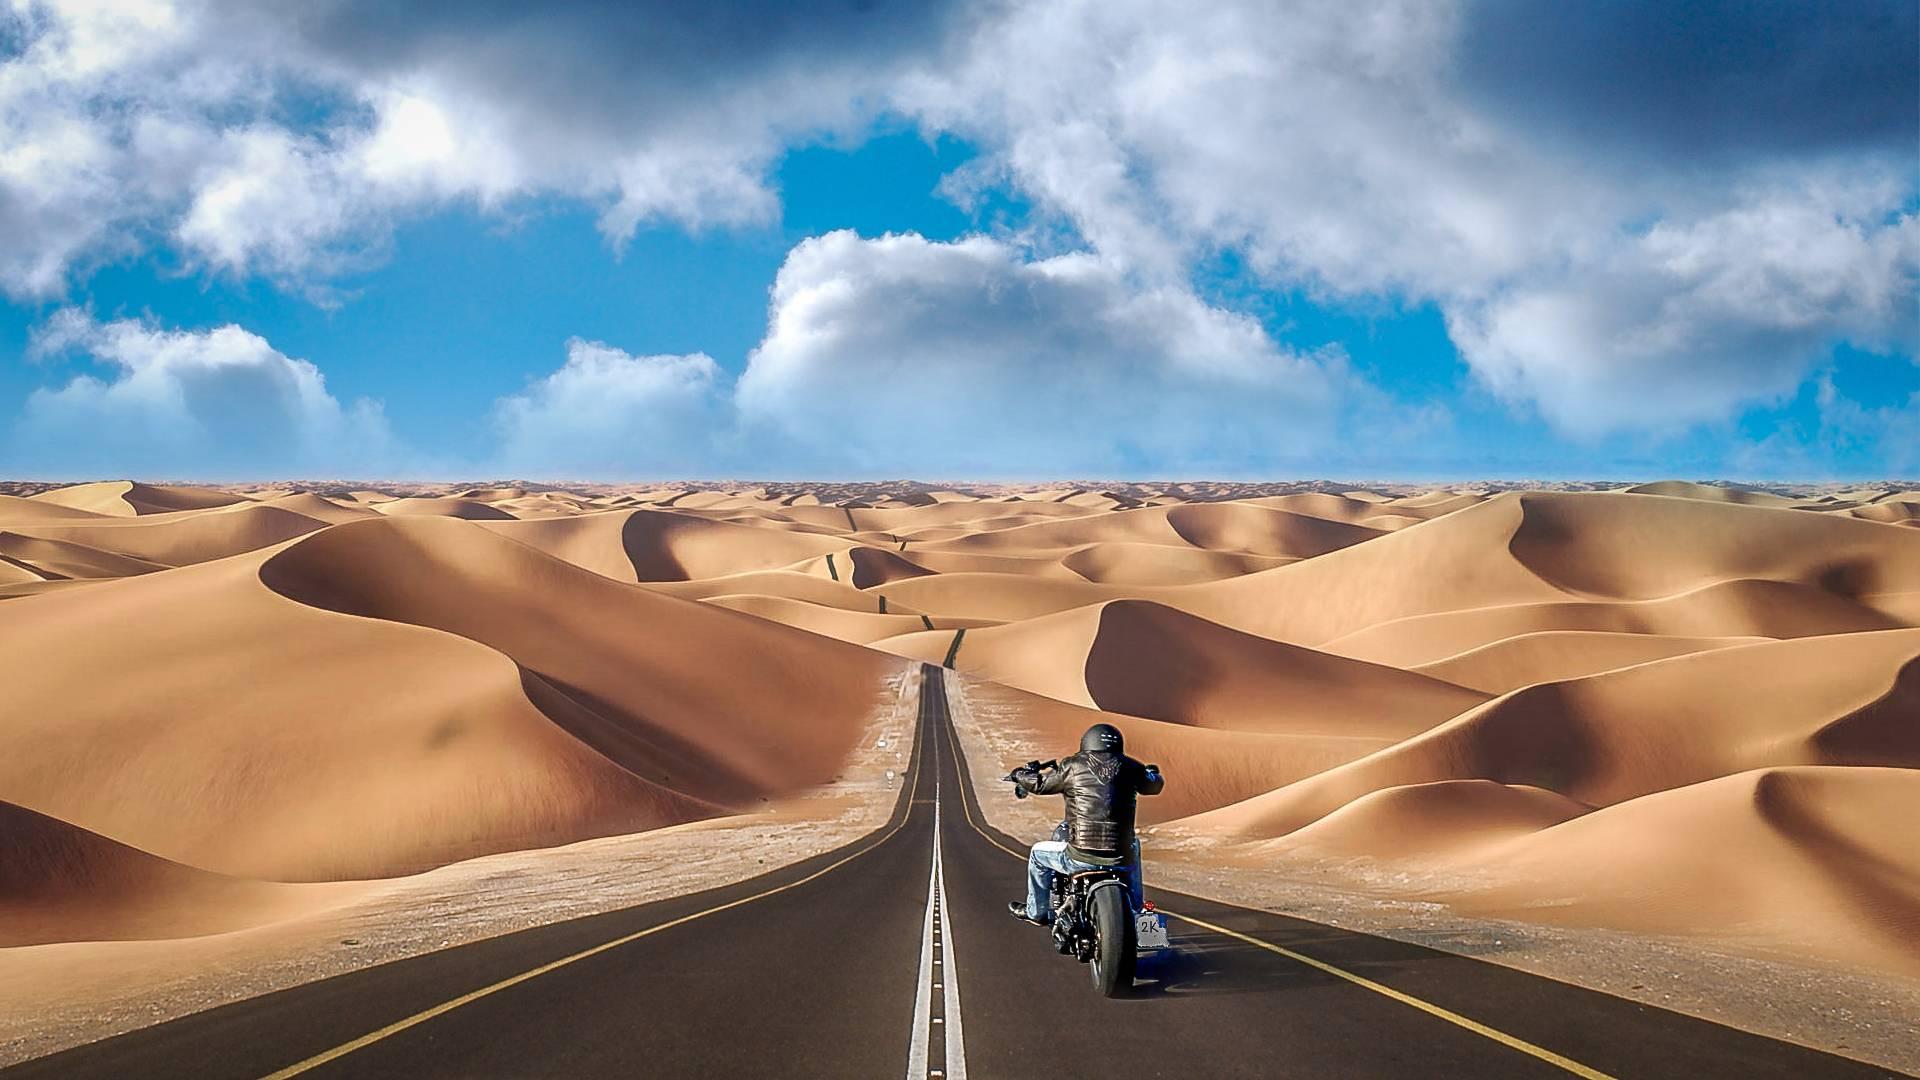 мотоцикл песок дорога дом  № 954616 без смс